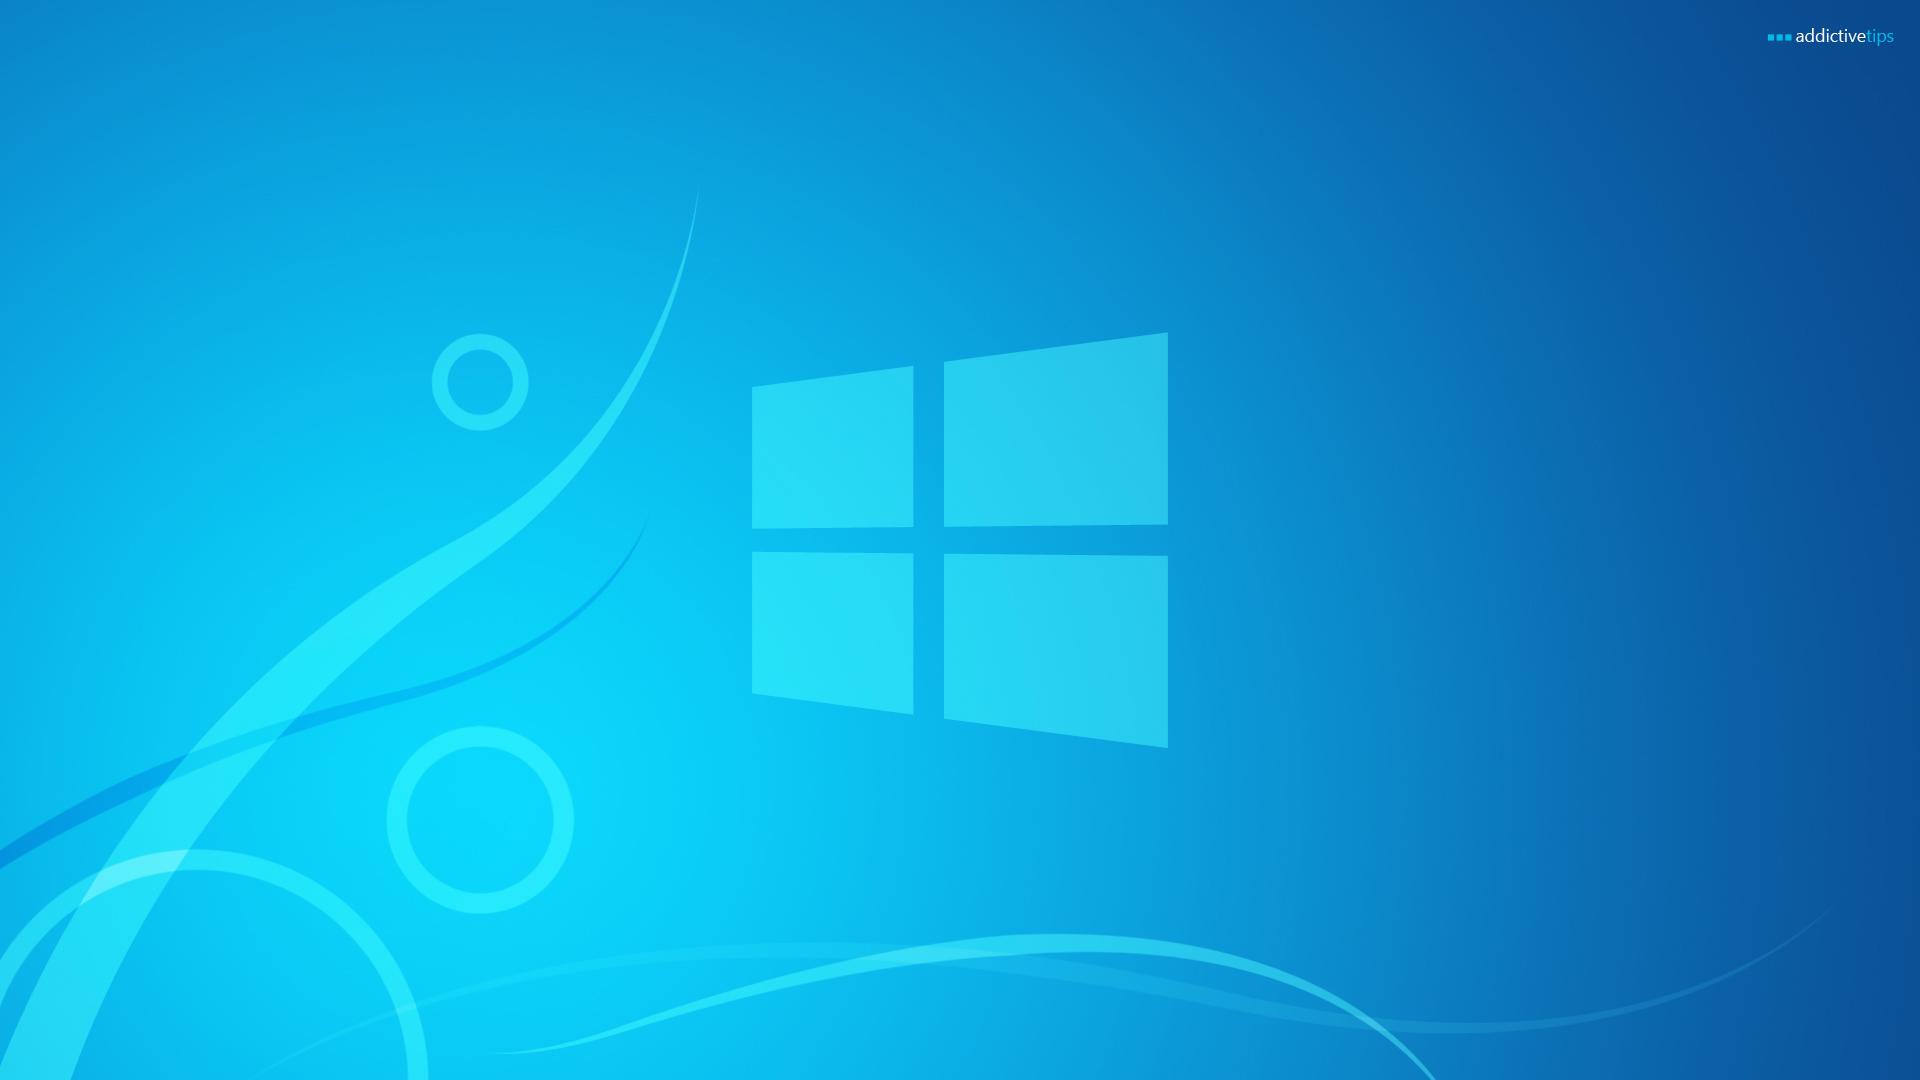 Windows 8 Desktop Wallpaper 6982464 1920x1080